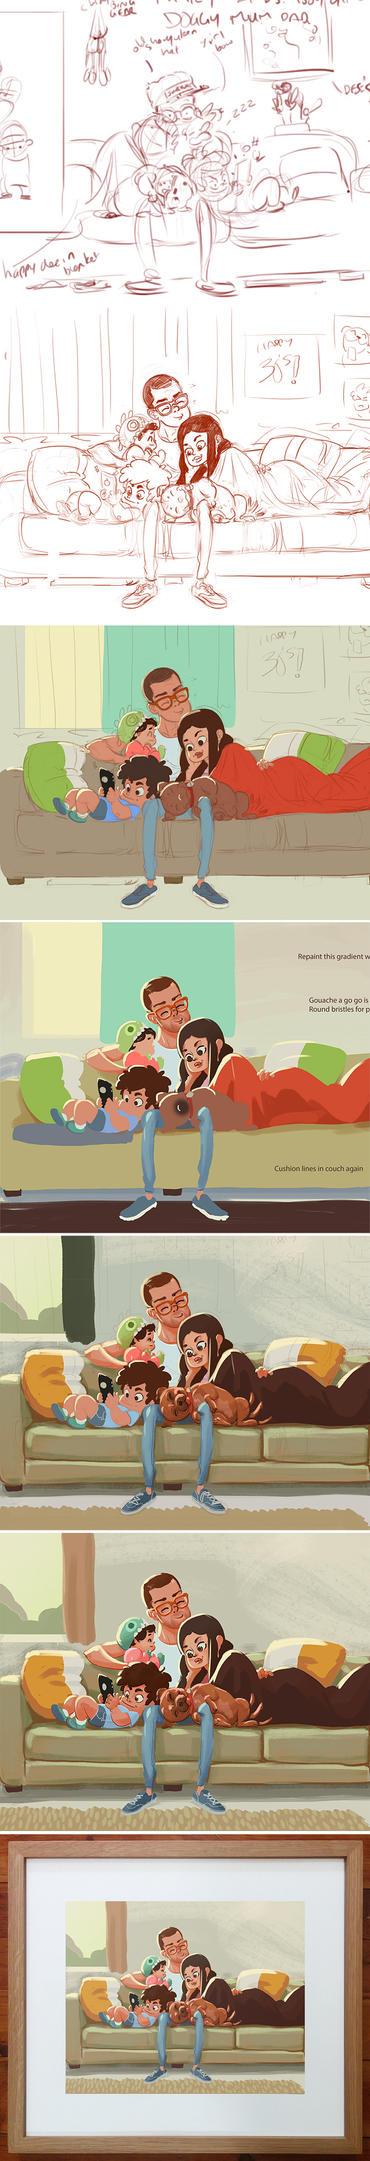 Family Process Long by DannyMcGillick